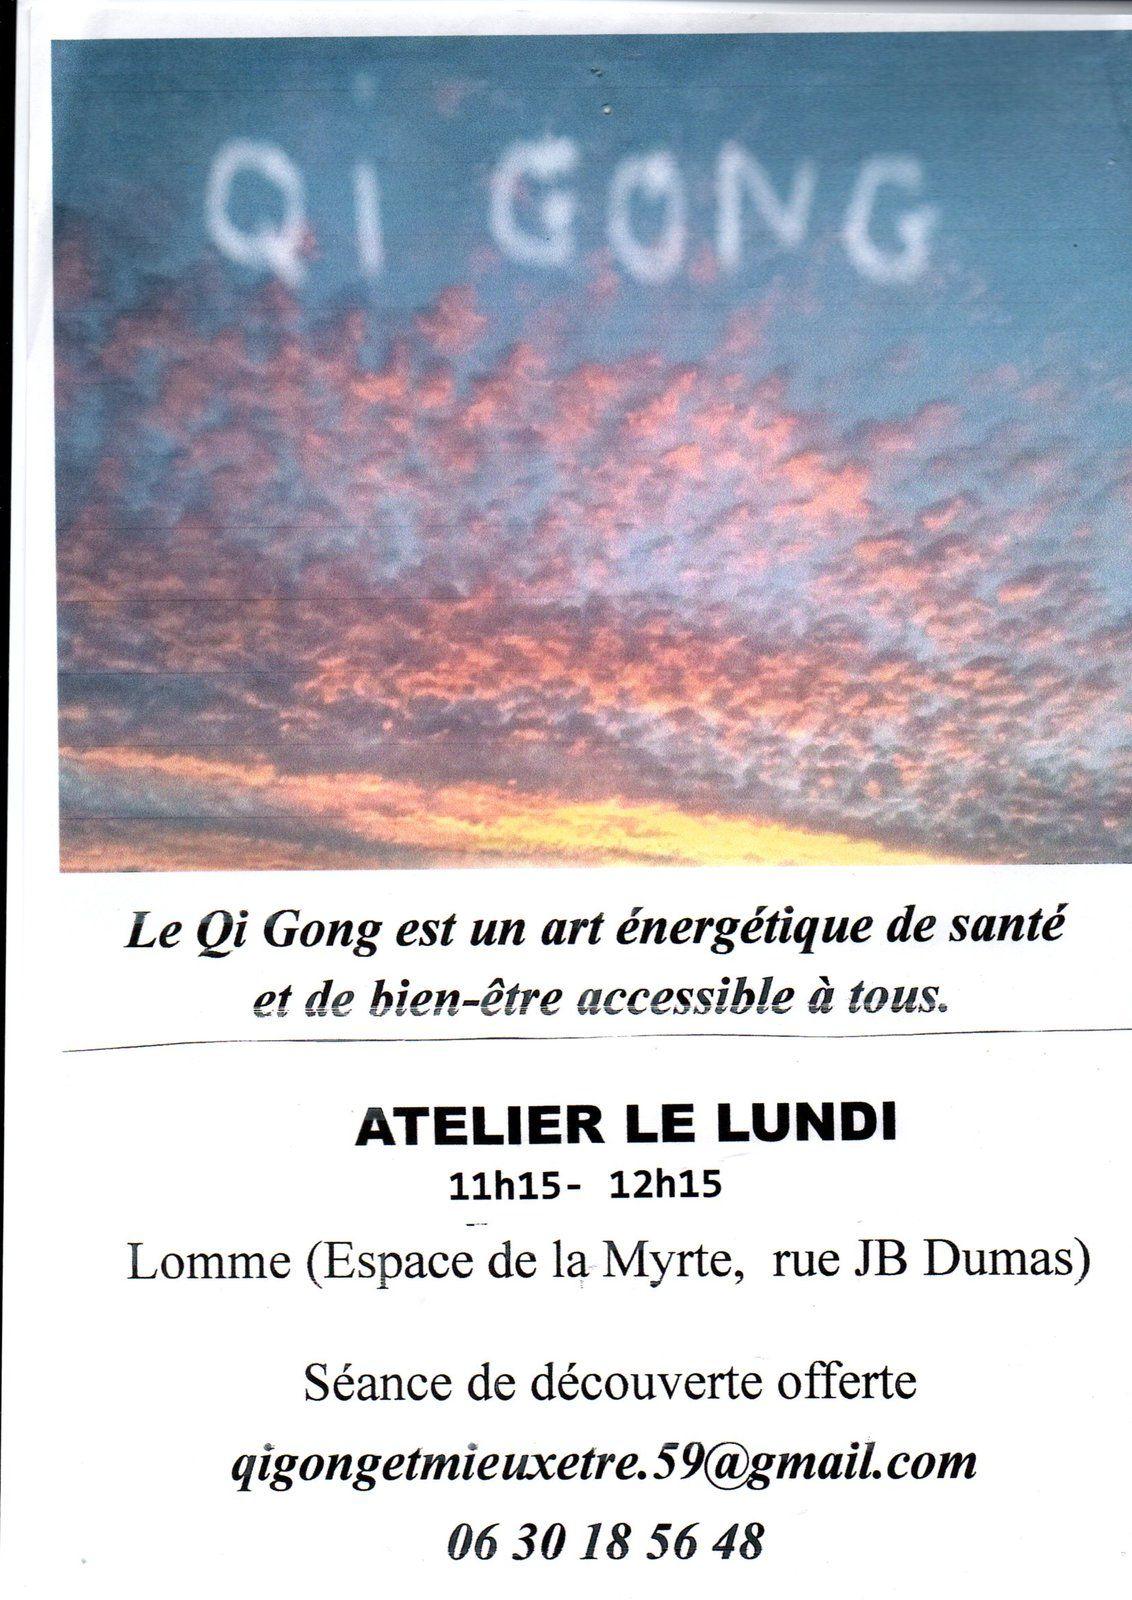 ATELIER QI GONG avec Christine Perri Le lundi 11h15/12h15